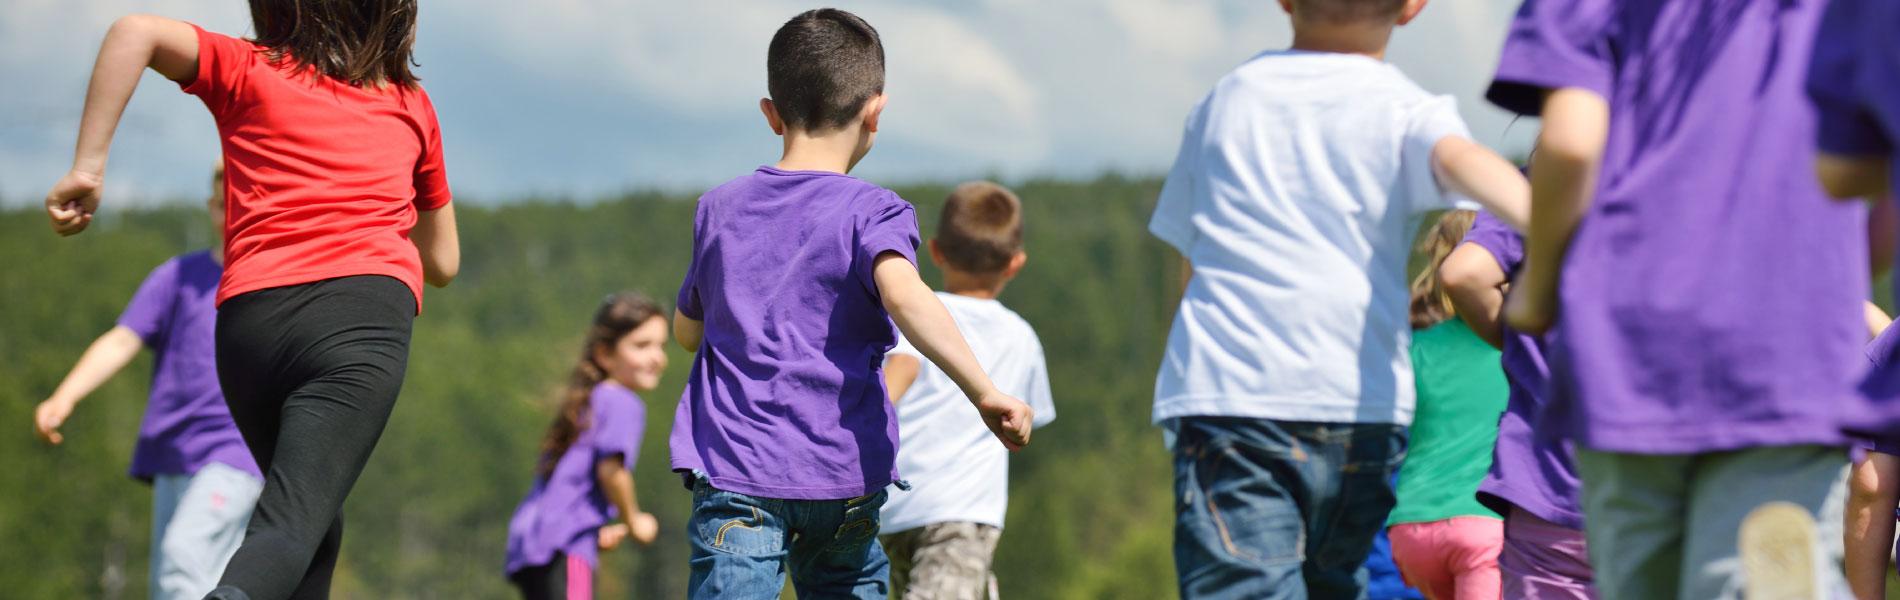 5_Childrens_Health_Groups_Inspiring_the_Next_Generation_1900x600.jpg